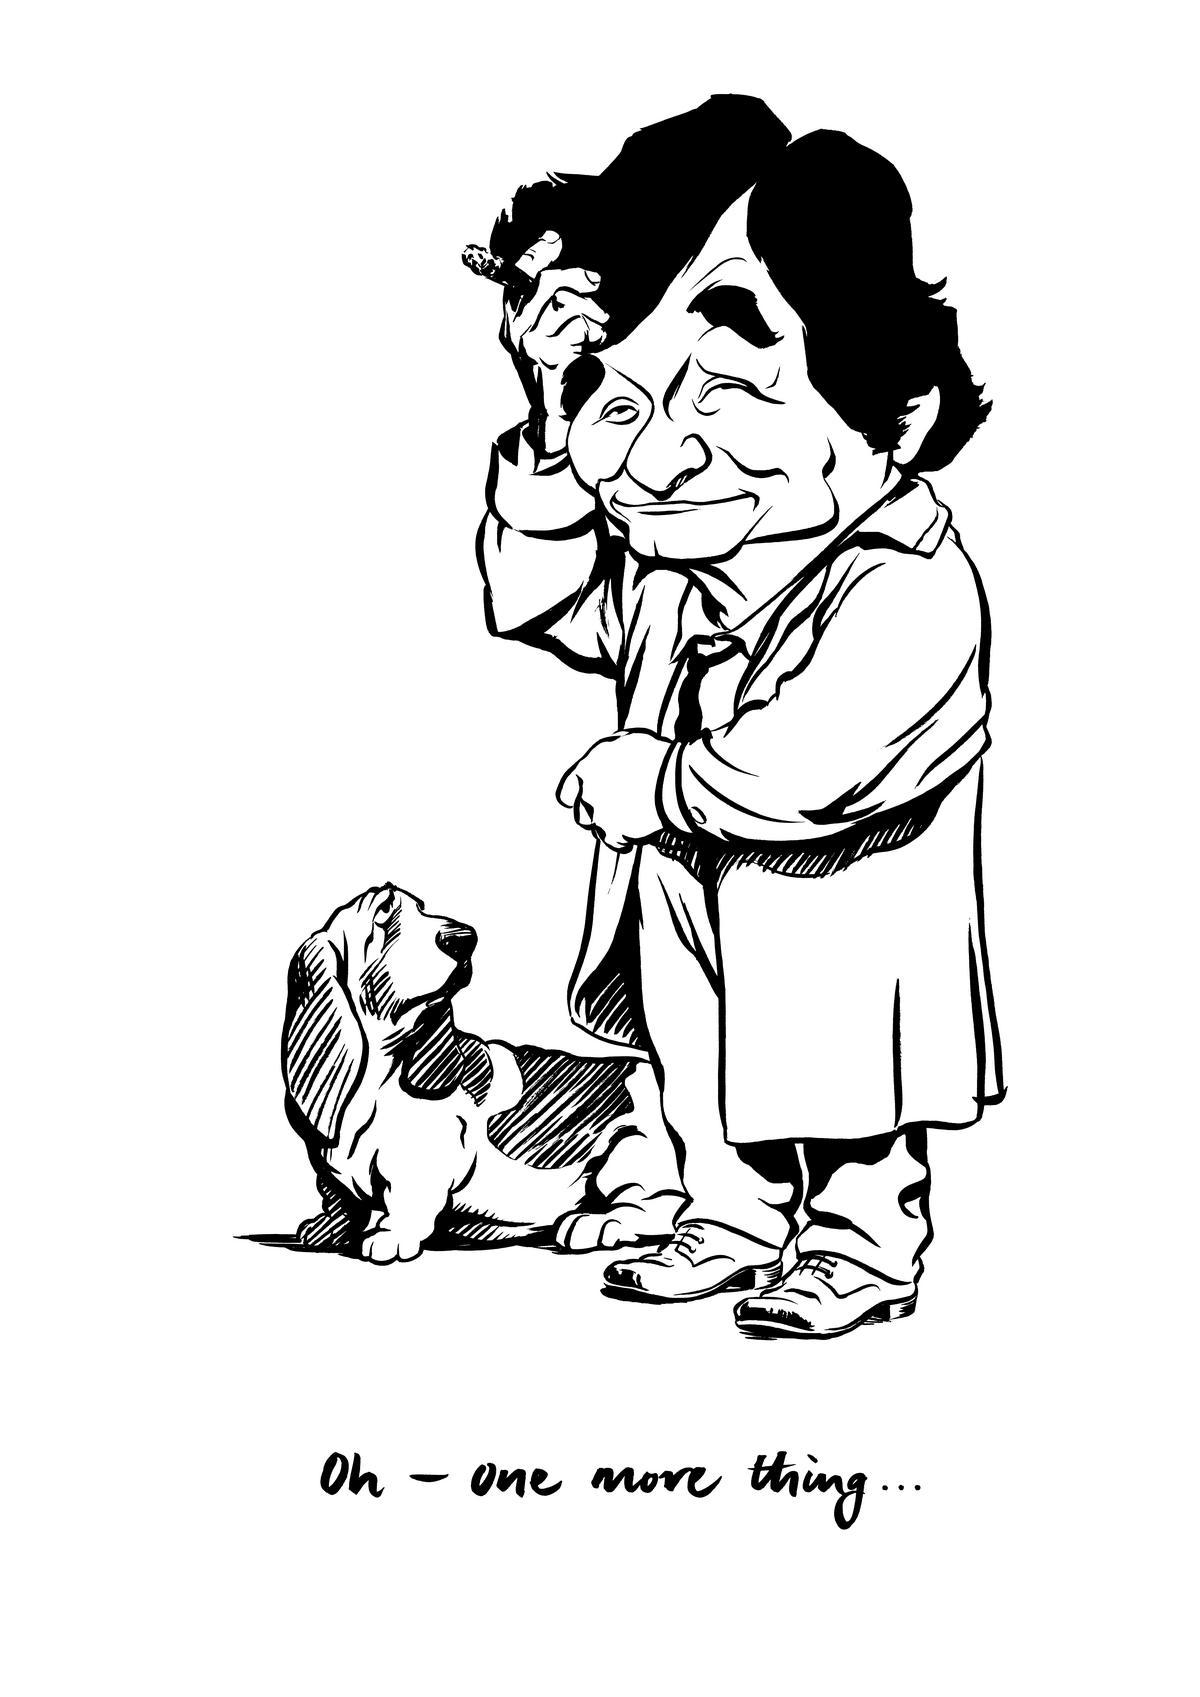 Colombo caricature